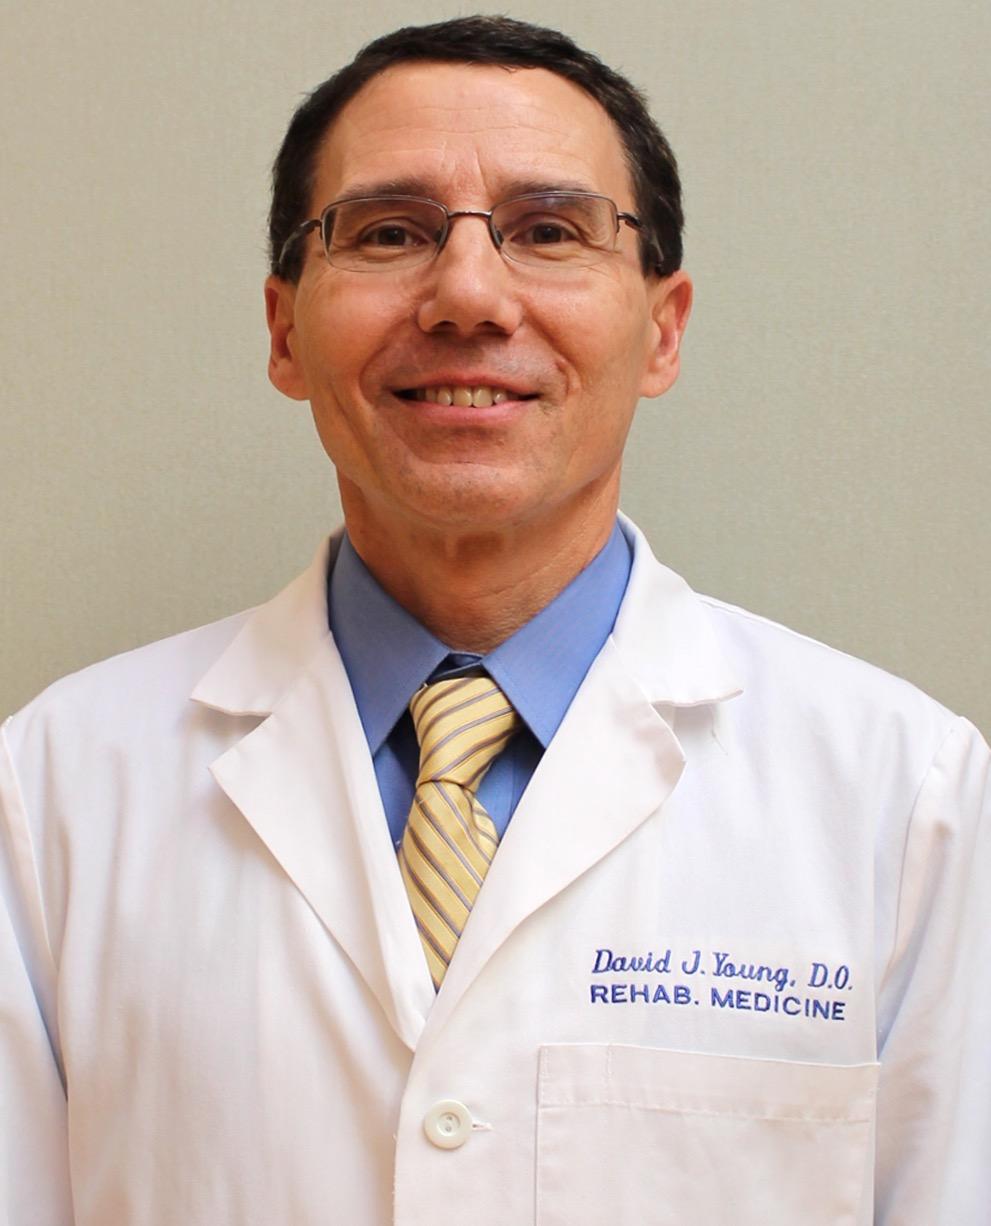 Doylestown Health: David J. Young, DO